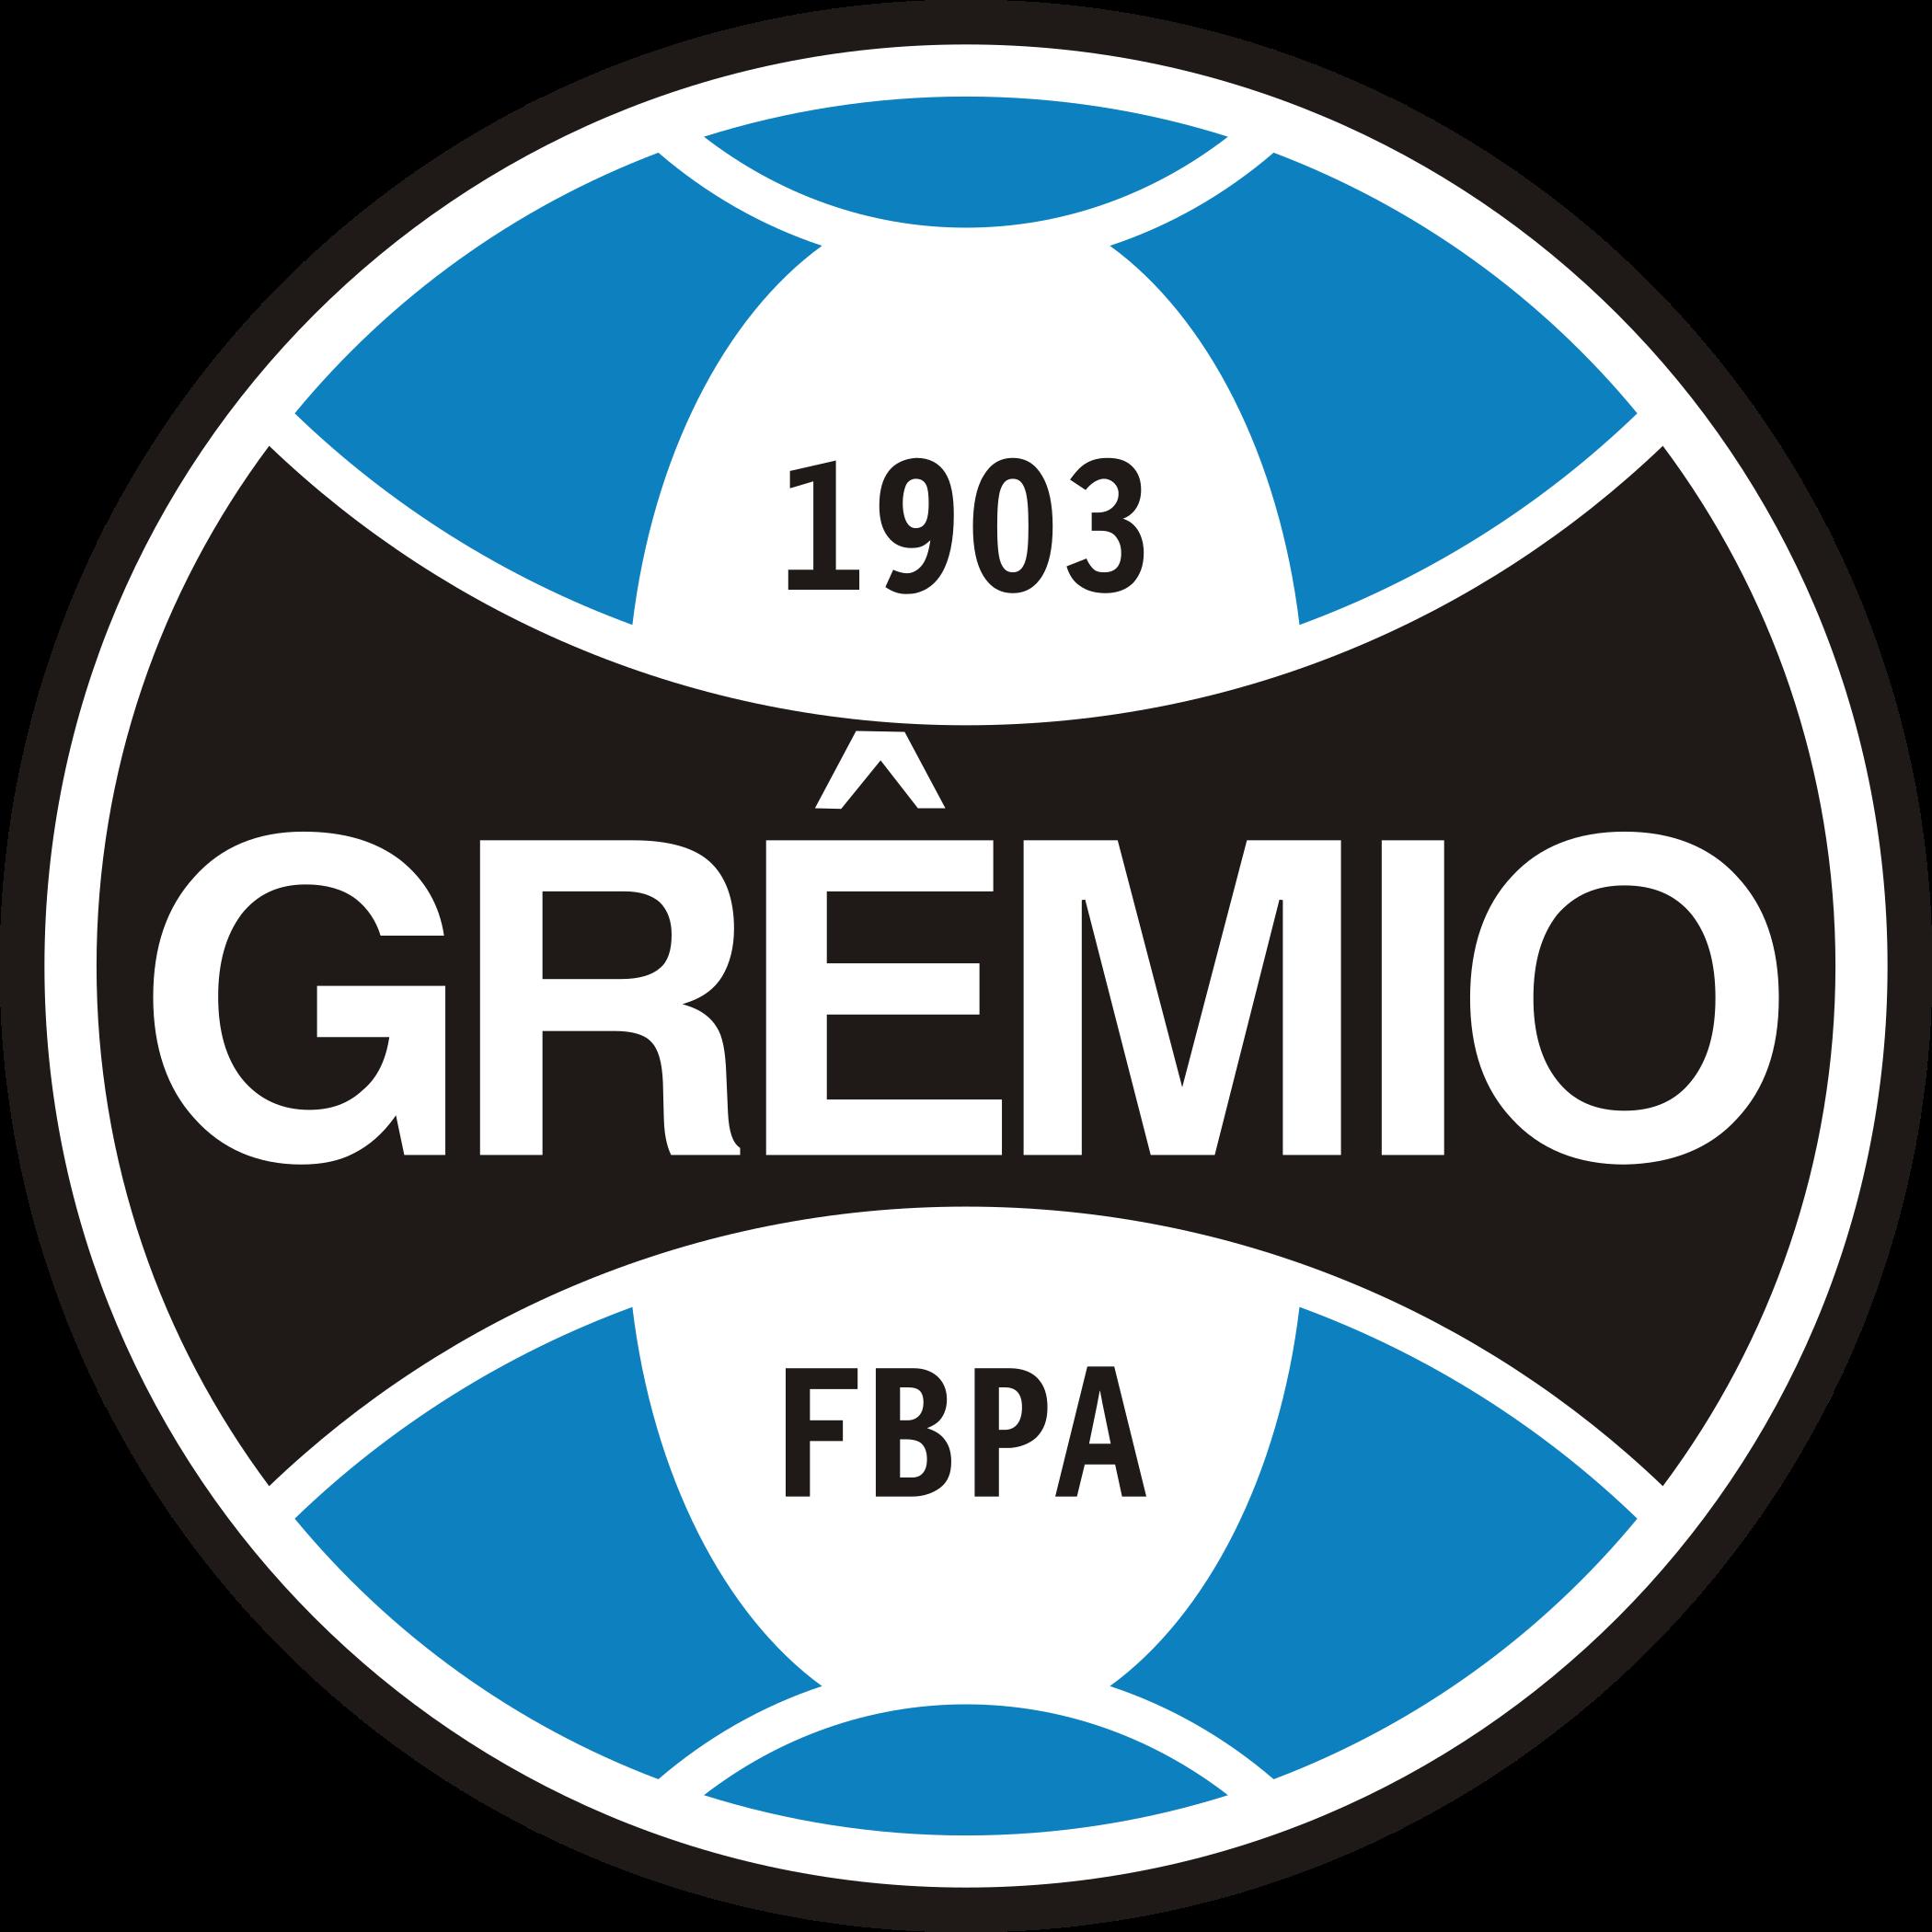 gremio logo escudo 2 - Grêmio Logo - Grêmio Escudo